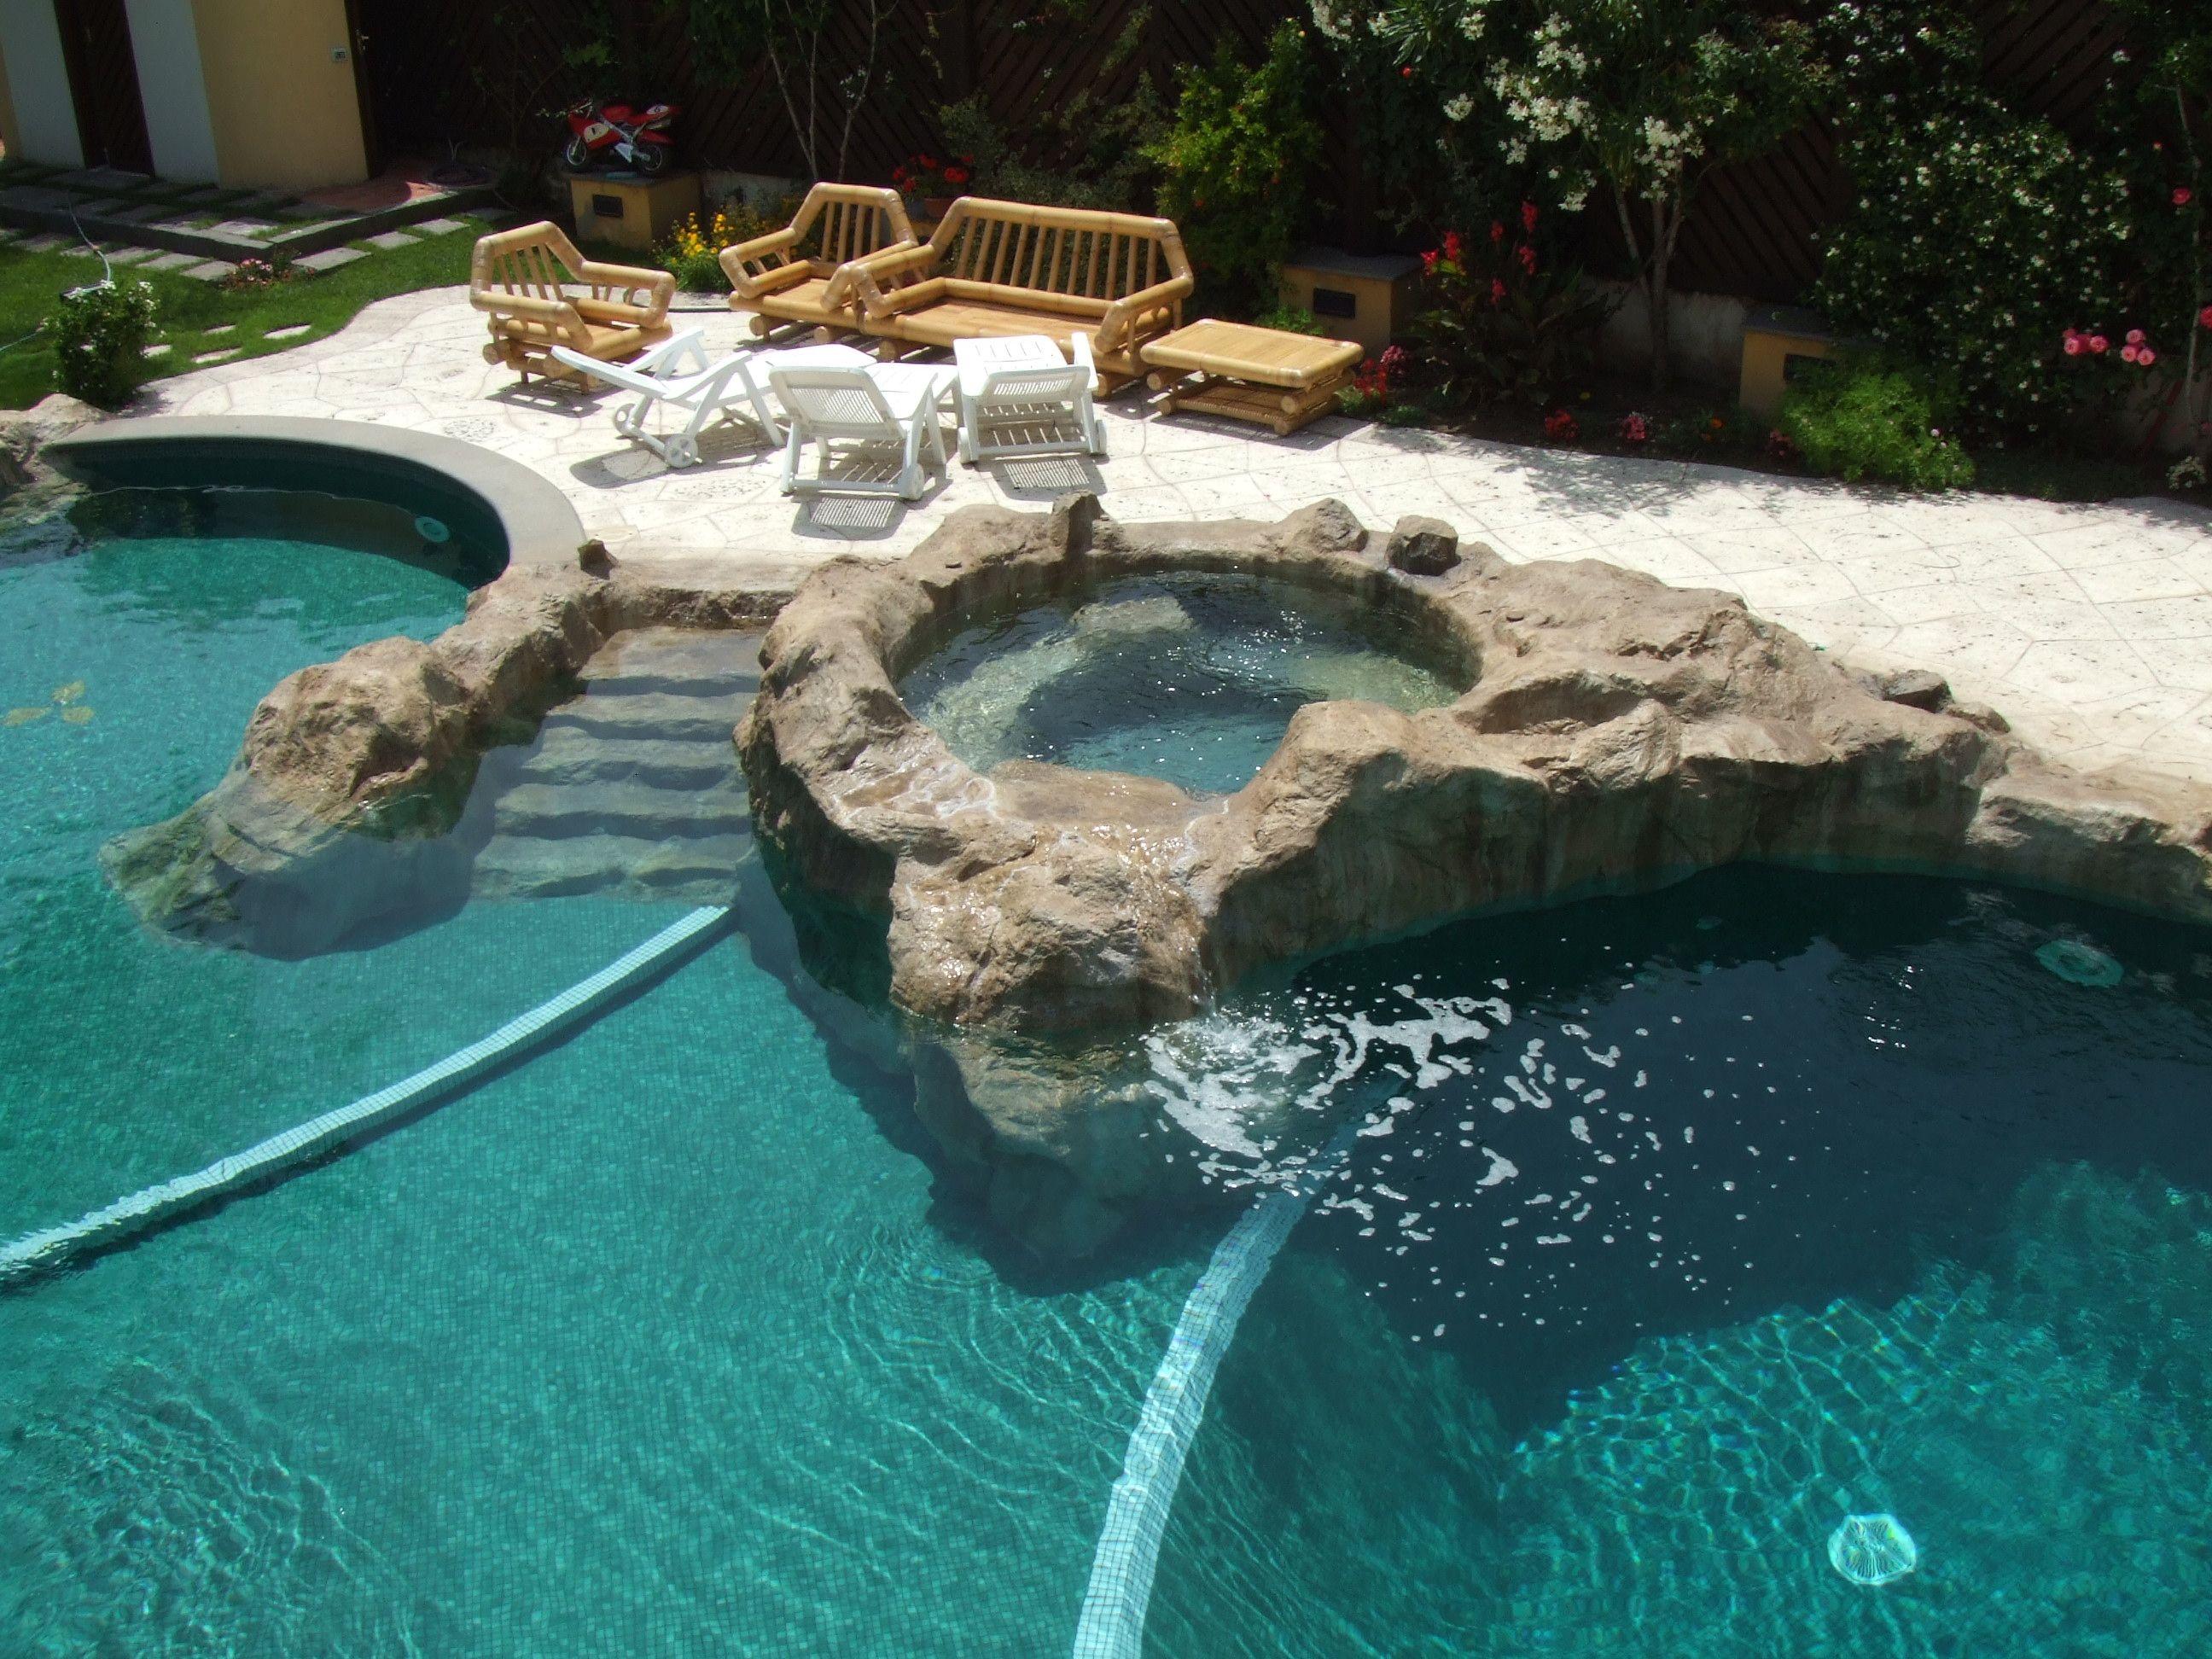 Piscina con jacuzzi piscinas pinterest arquitetura for Piscinas con jacuzzi precio